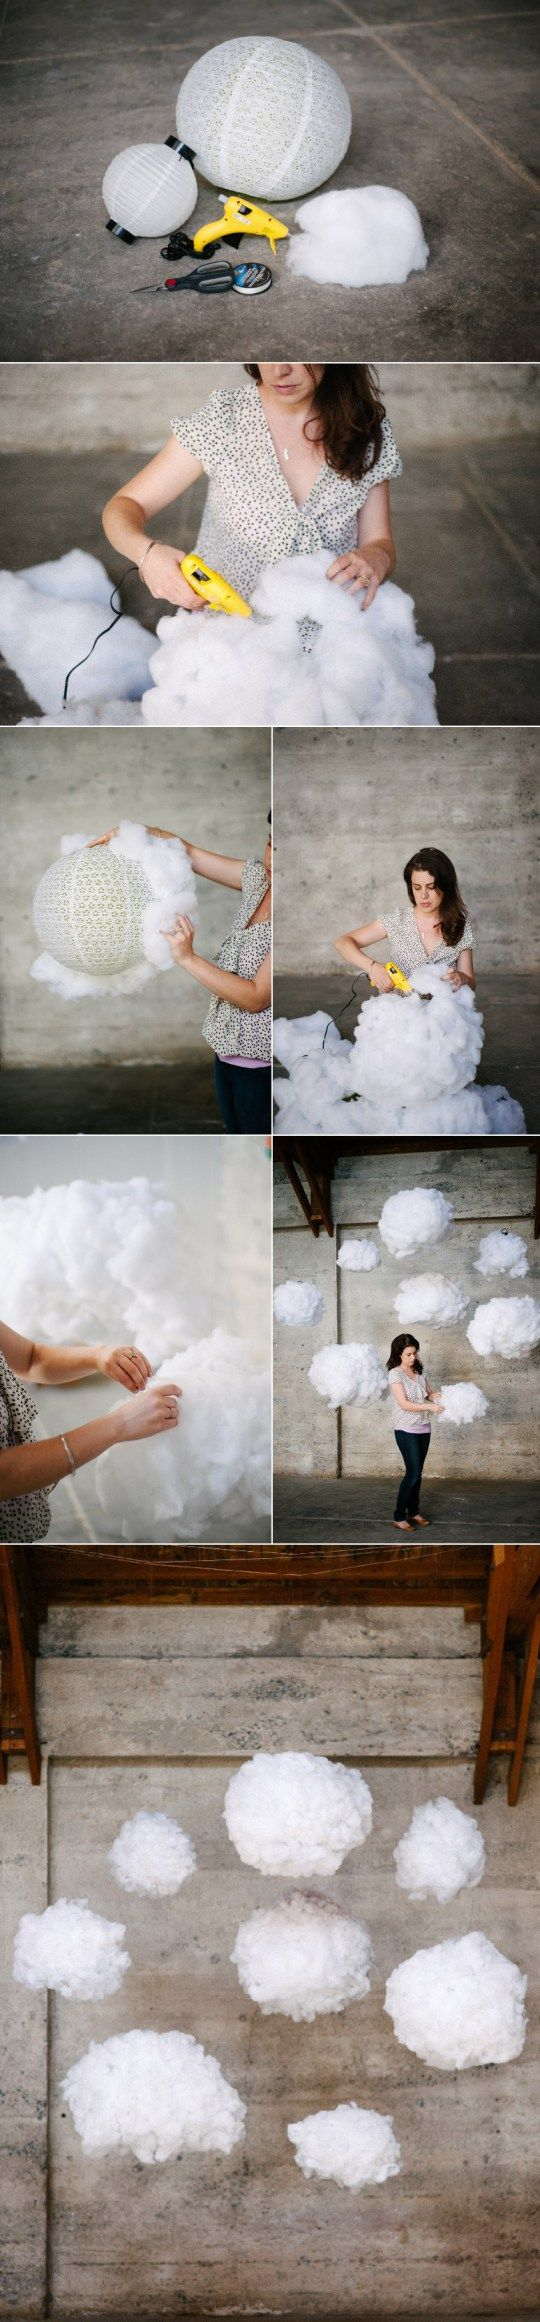 Fai da te lampada a forma di nuvola how to diy cloud for Ikea cuscino nuvola